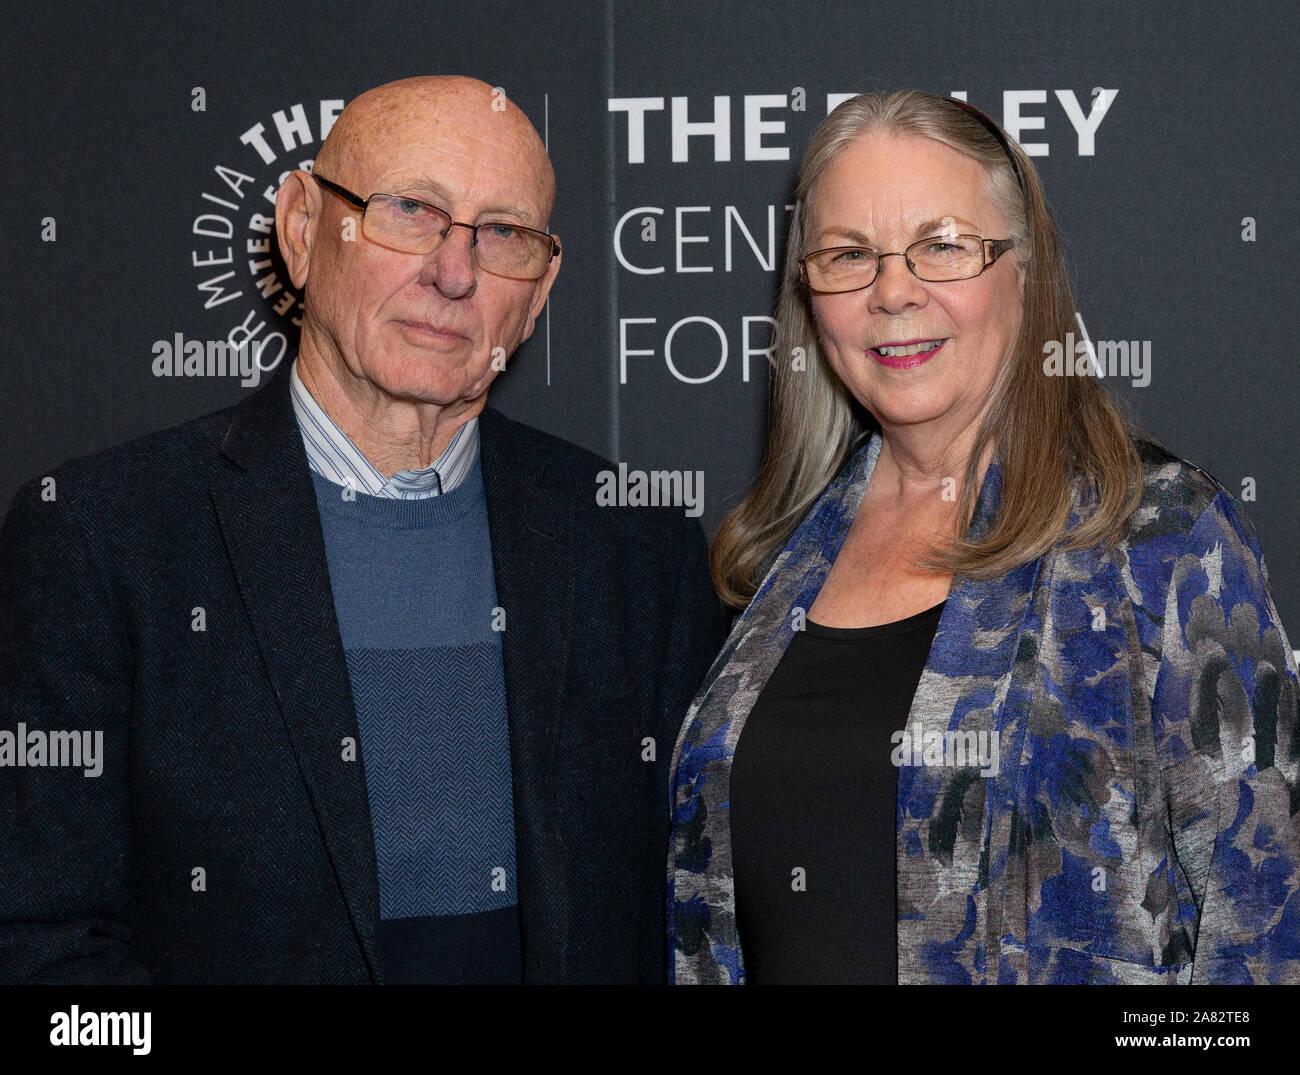 New York Ny November 5 2019 Sandy Philips And Lonnie